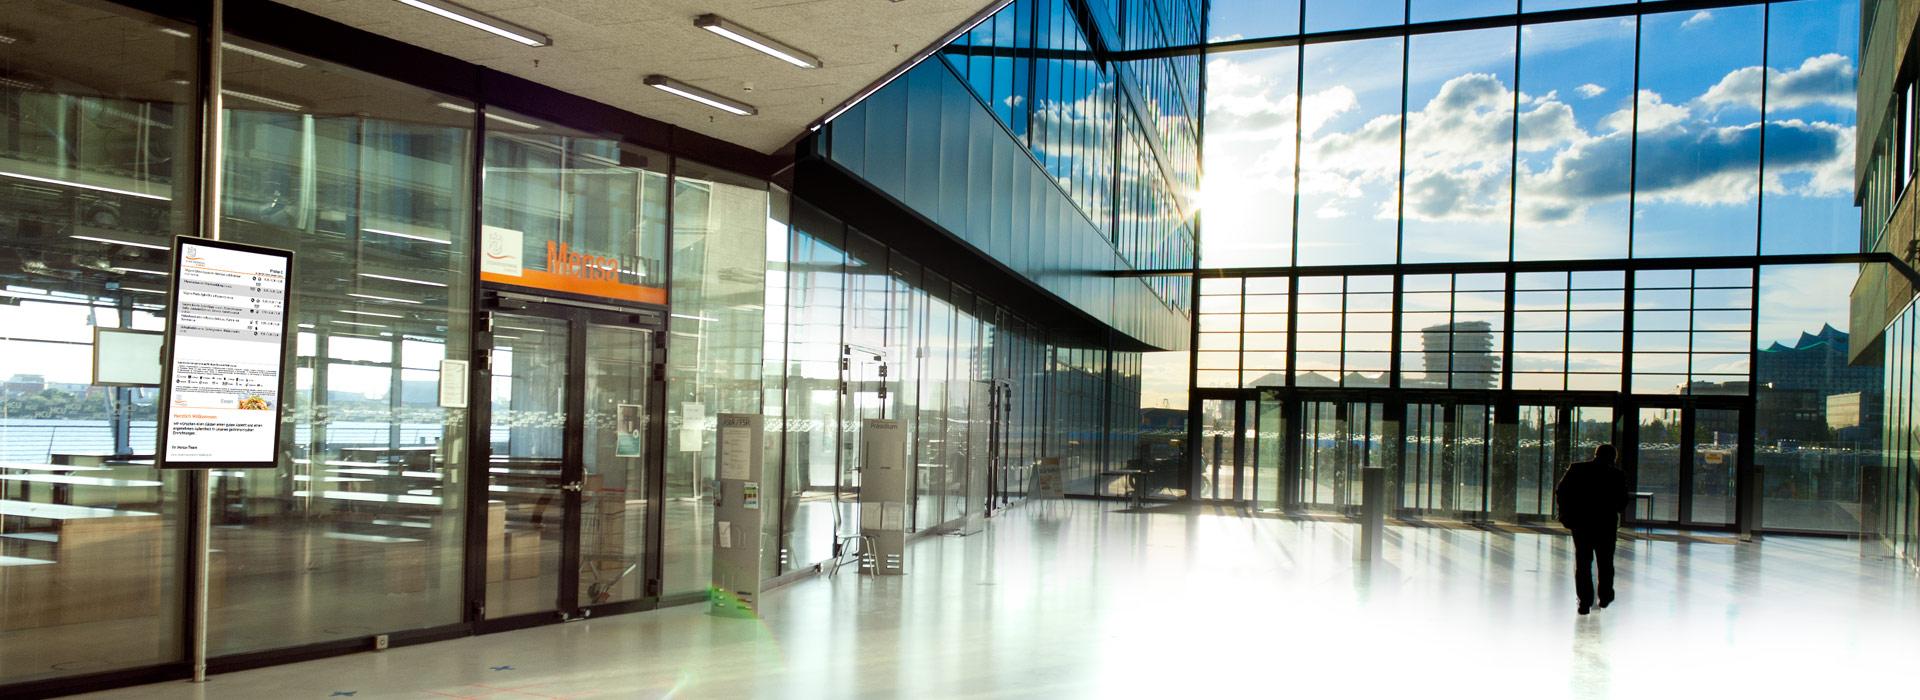 Infomax gmbh studierendenwerk hamburg moderne for Moderne architektur hamburg